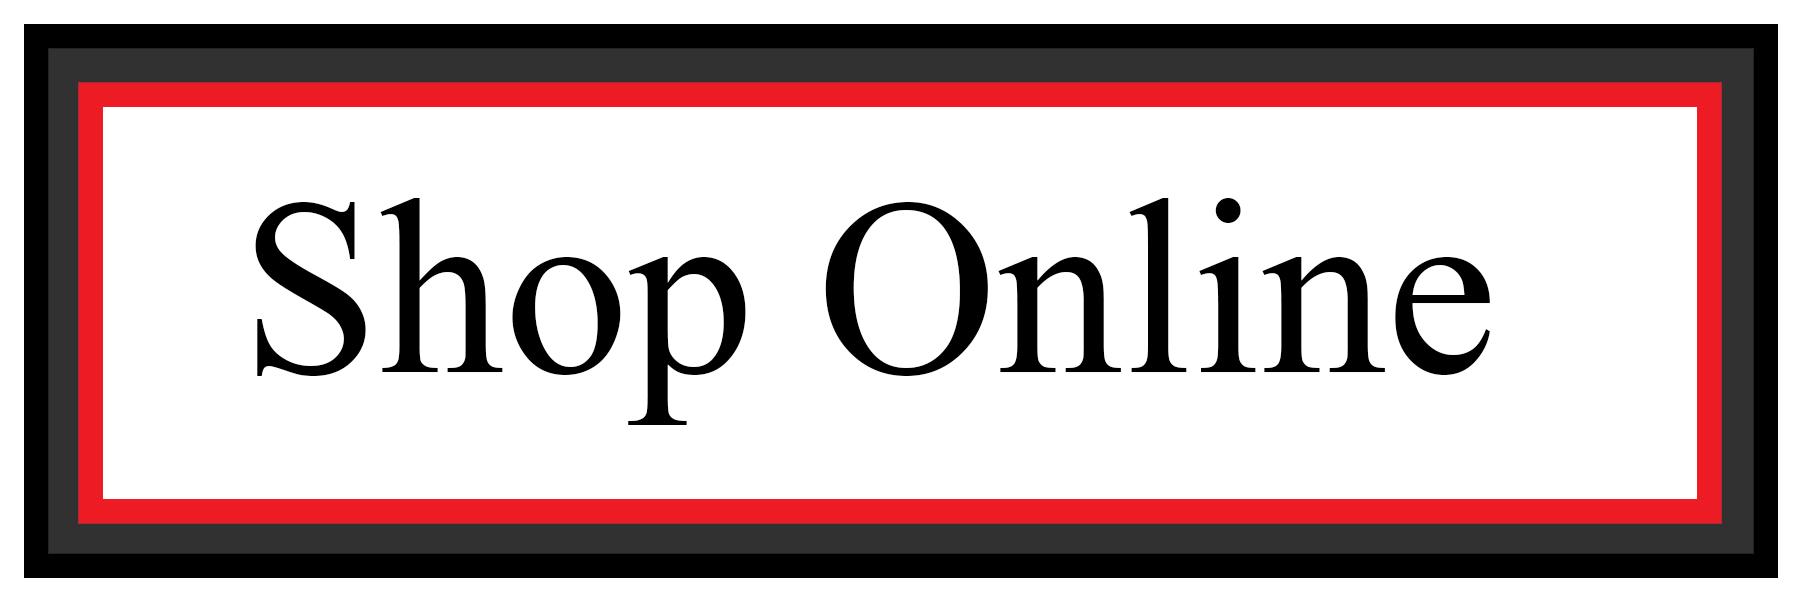 shop-online-copy.jpg